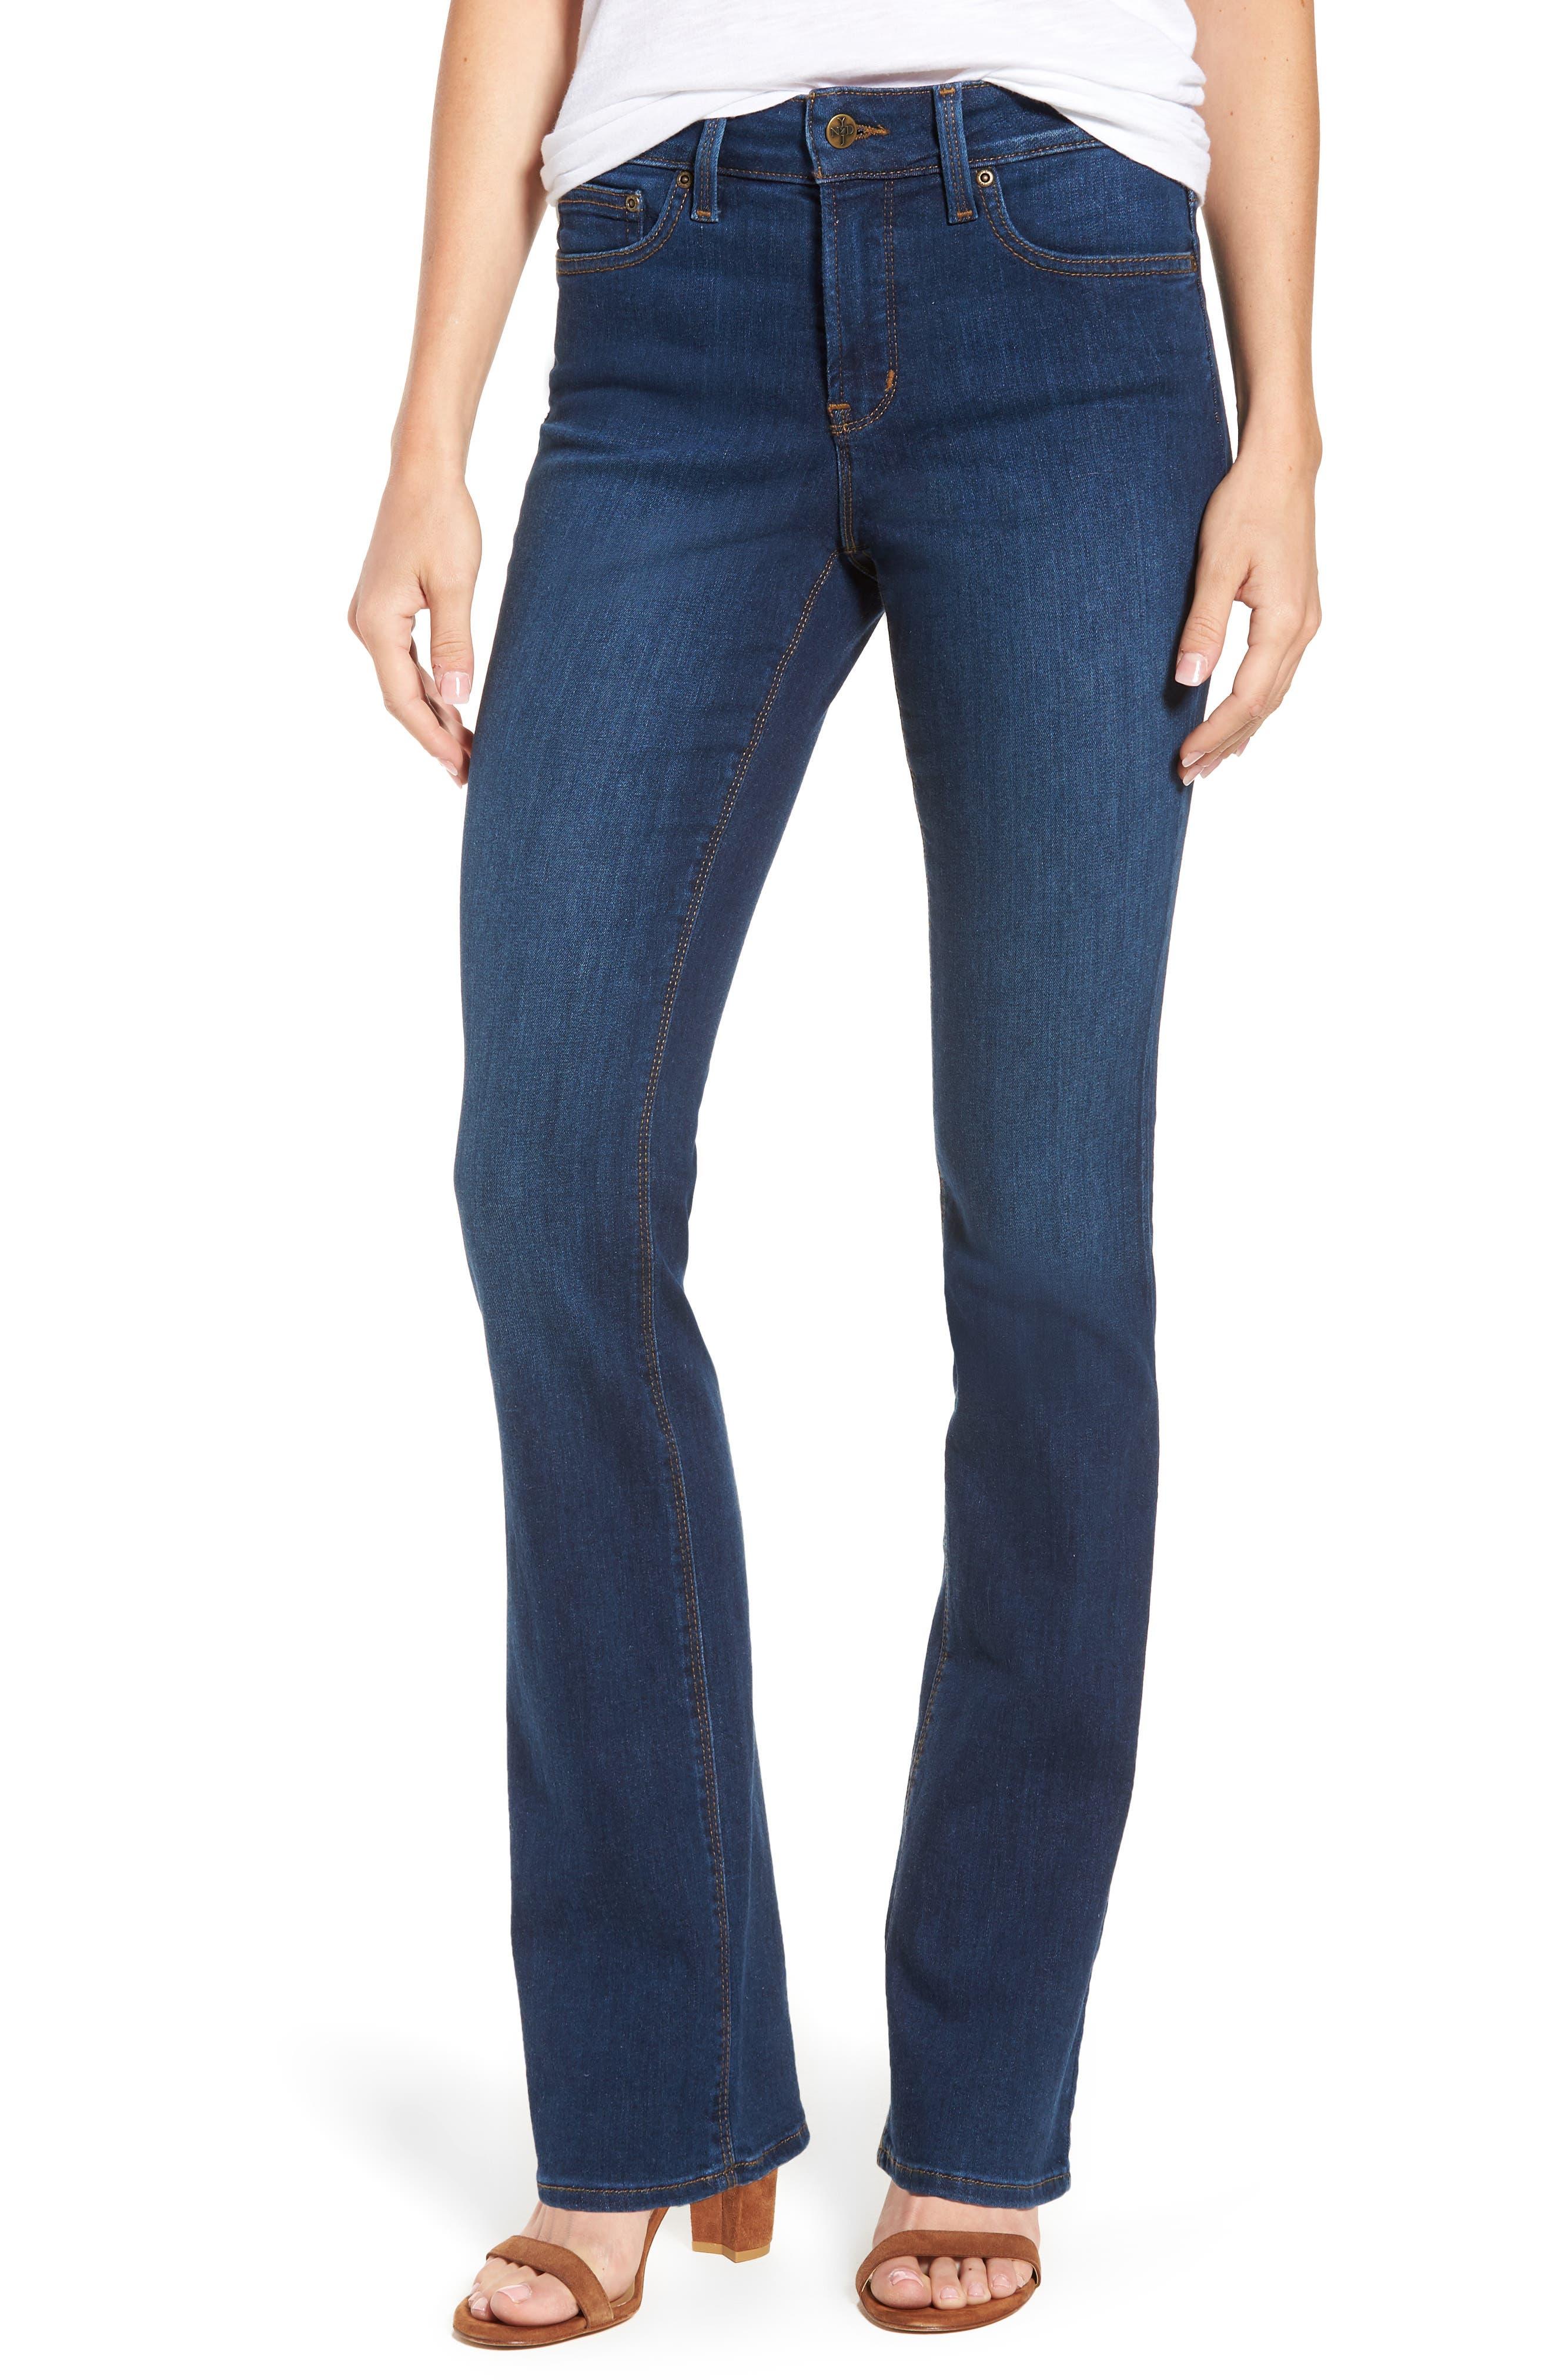 NYDJ Billie Mini Bootcut Jeans (Cooper)